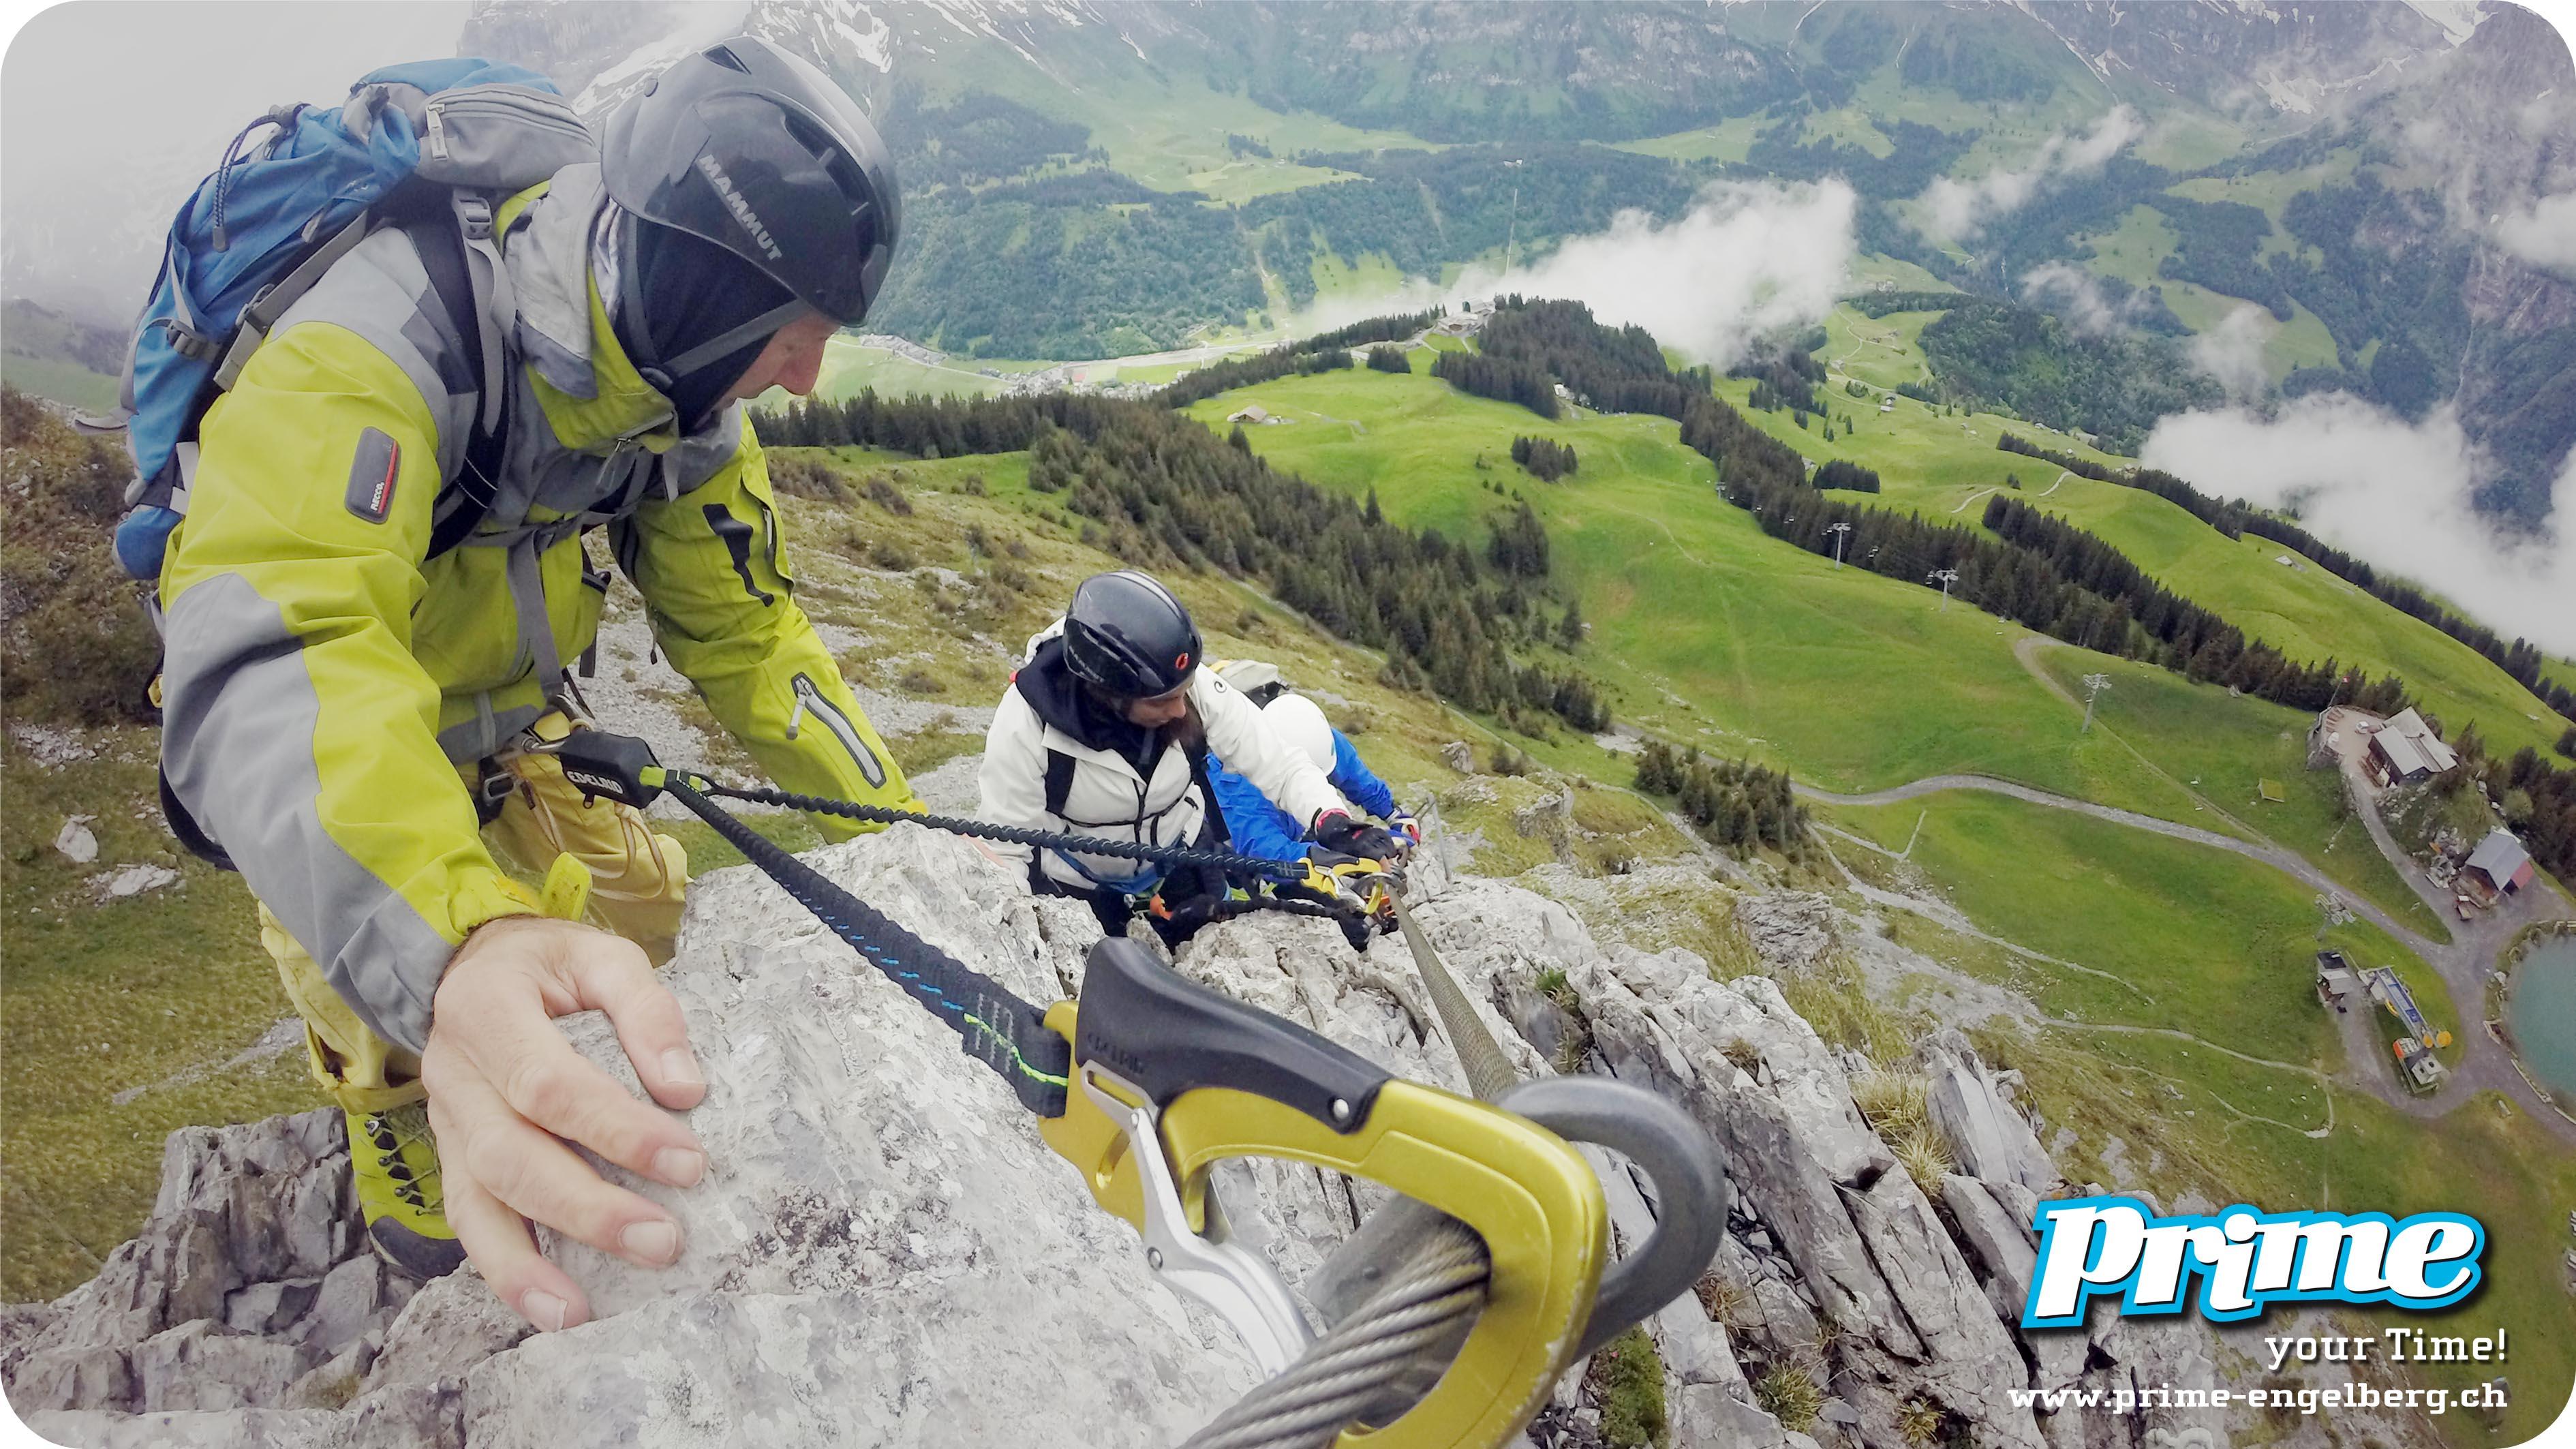 Klettersteigset Mieten Engelberg : Klettersteig u cbrunnistöckliu d engelberg mountain guide